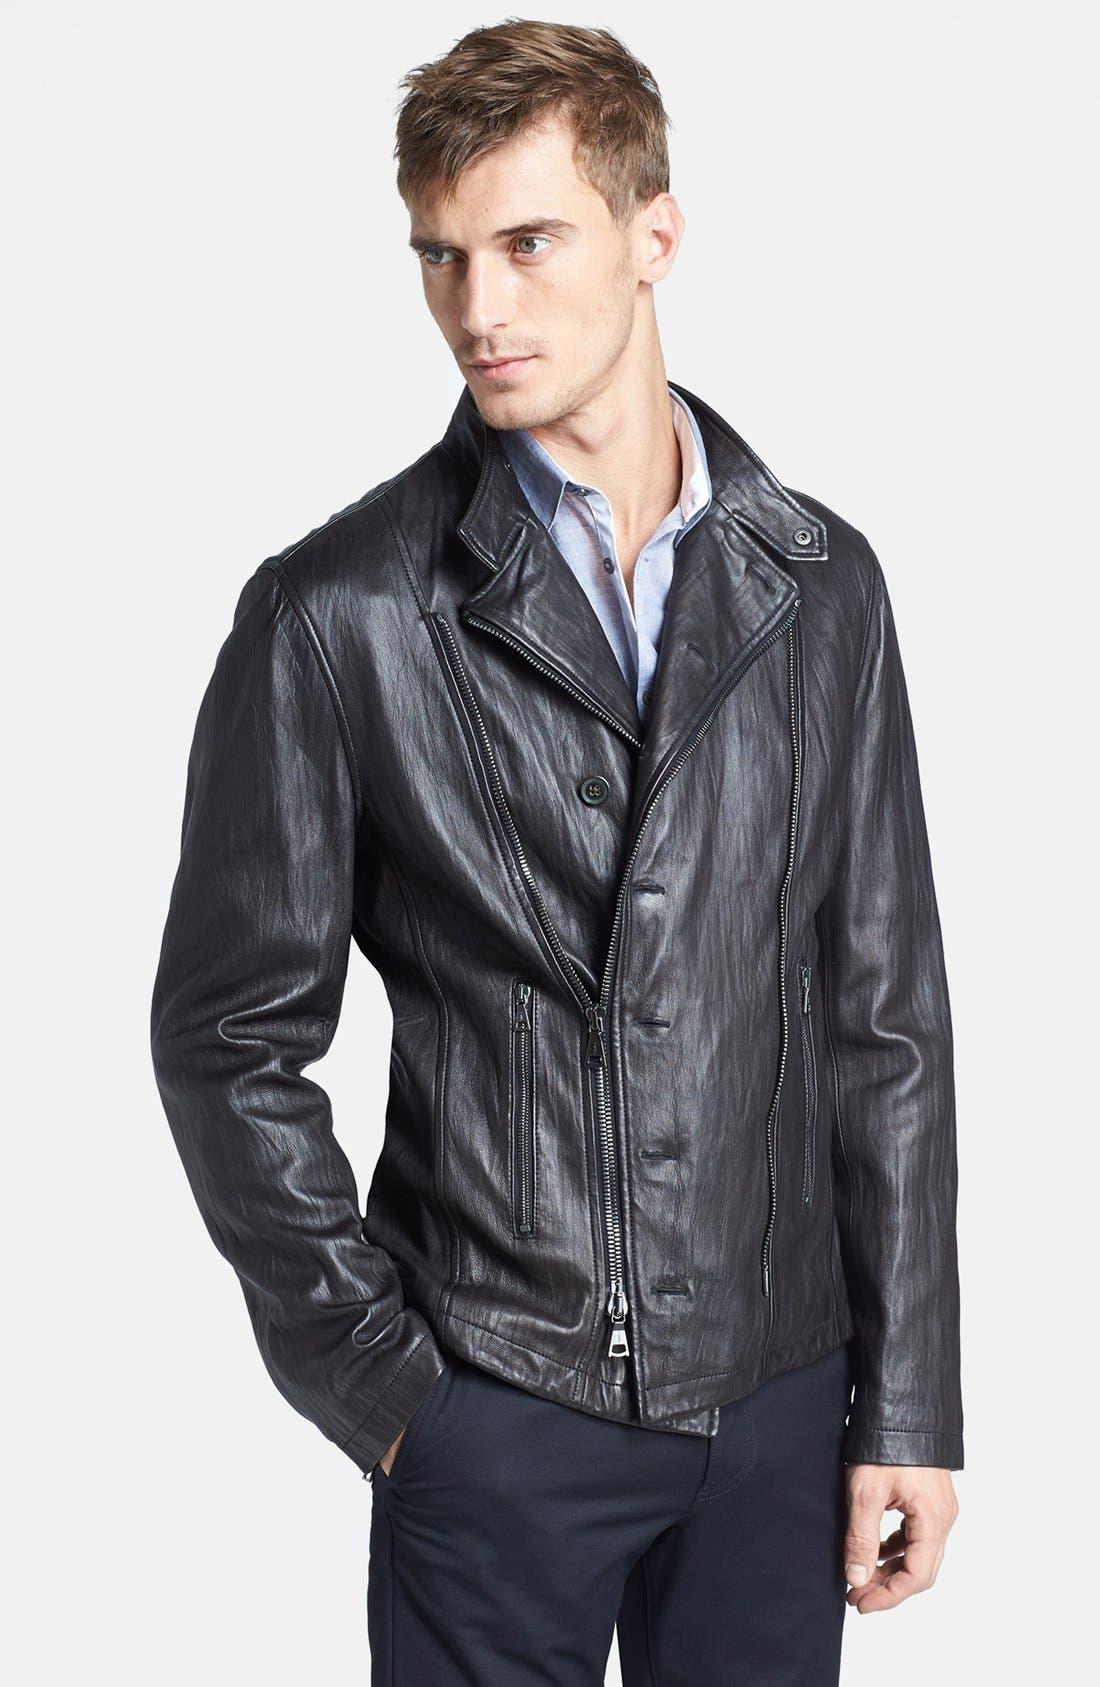 Alternate Image 1 Selected - John Varvatos Collection 'Nappa' Leather Biker Jacket